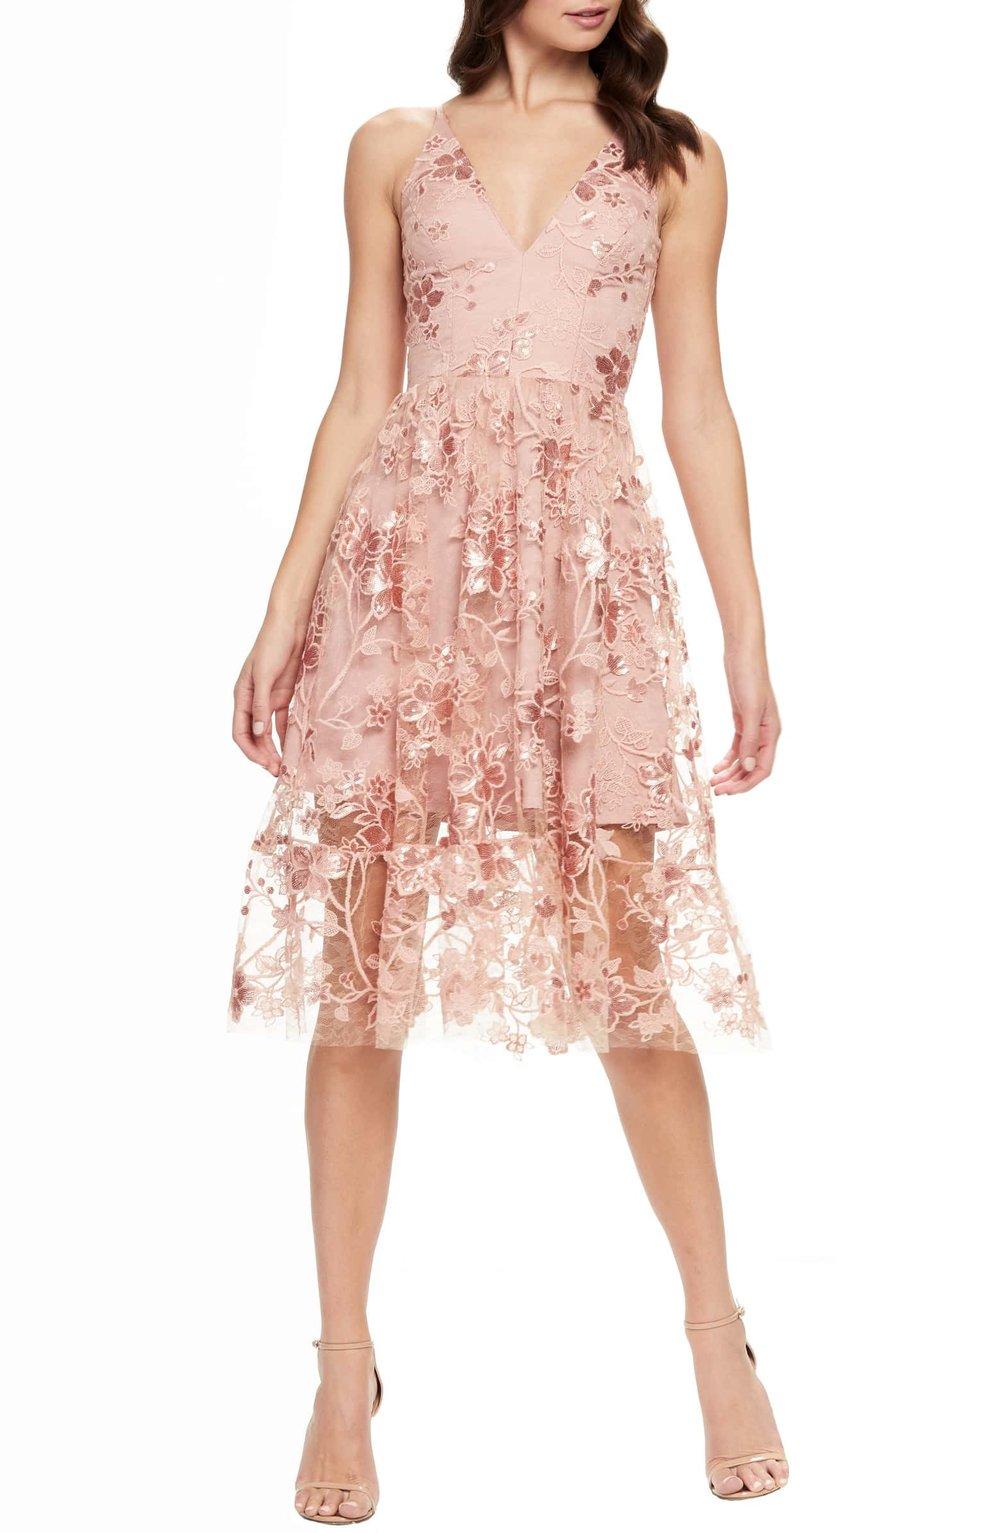 floral mesh cocktail dress.jpg